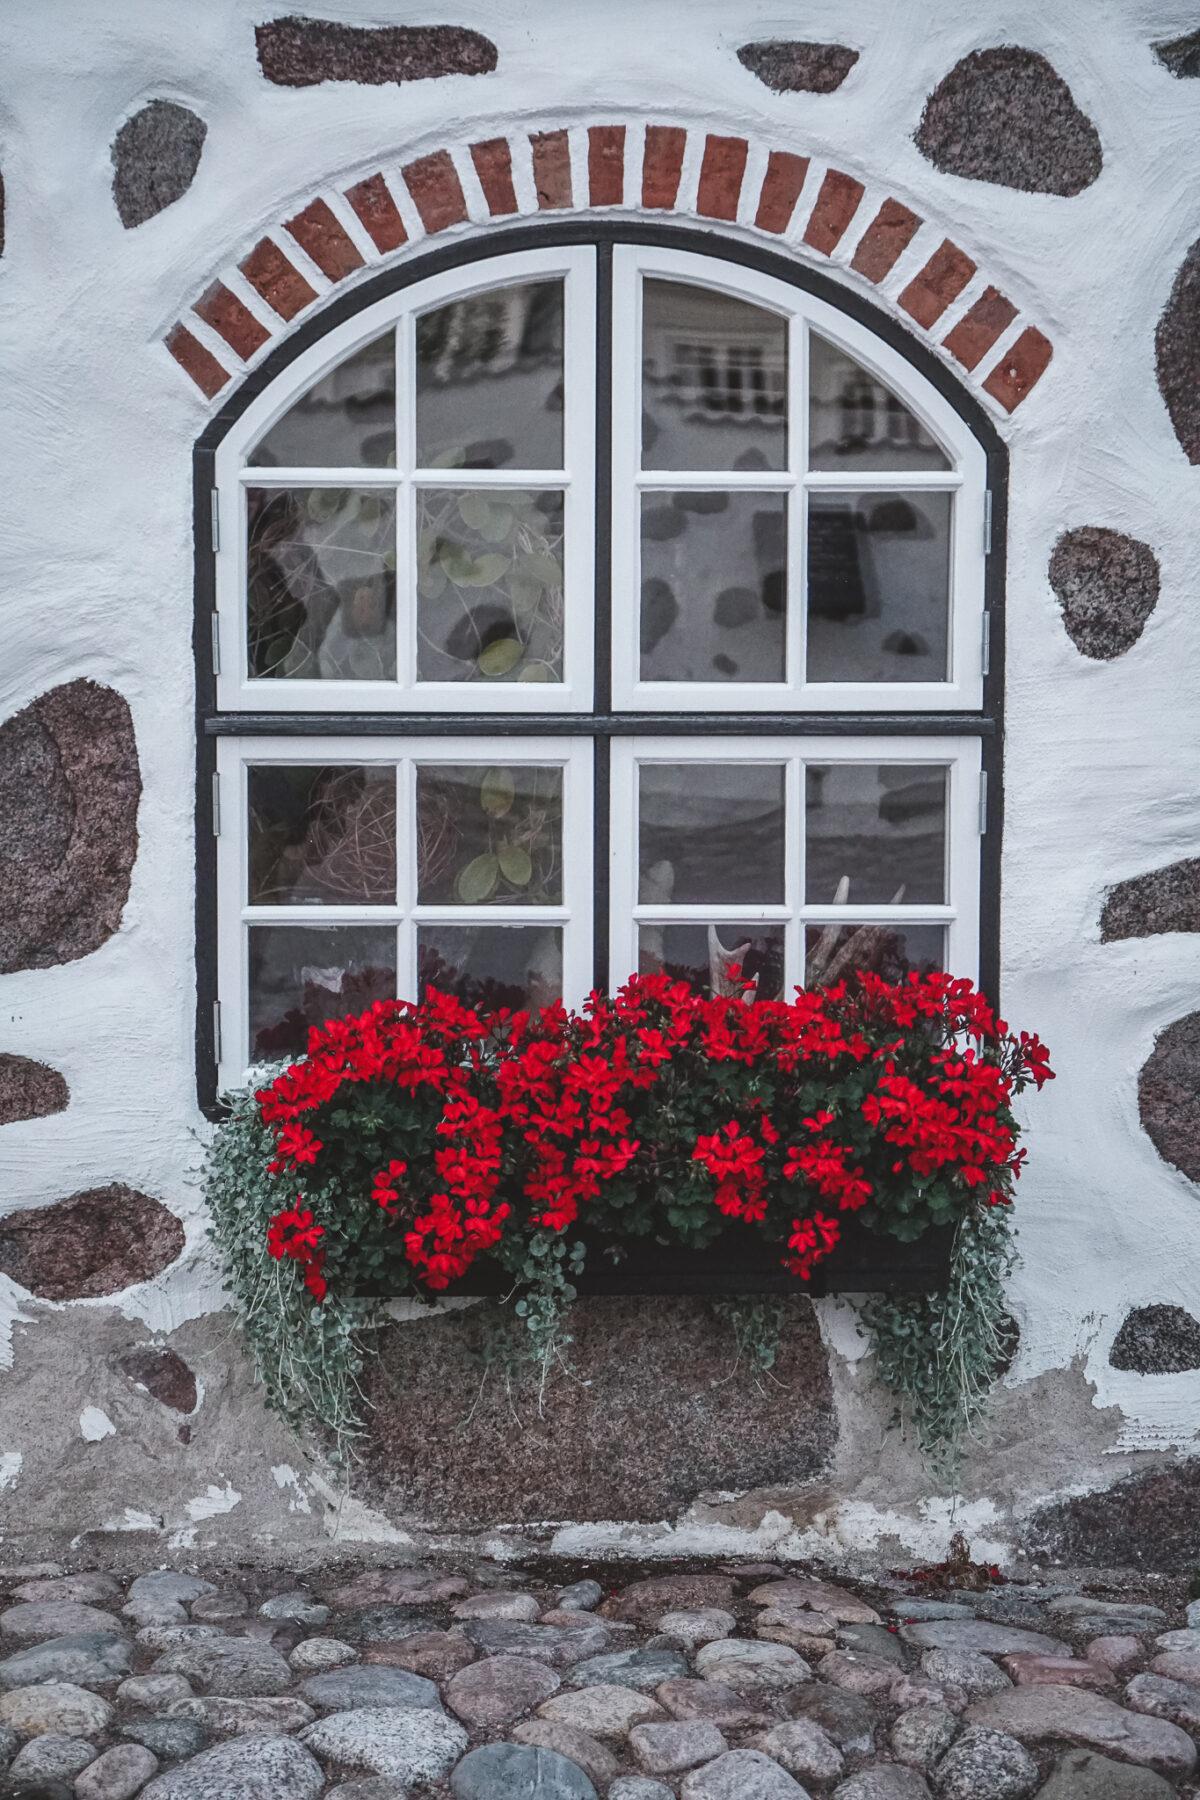 Eriksberg Blekinge